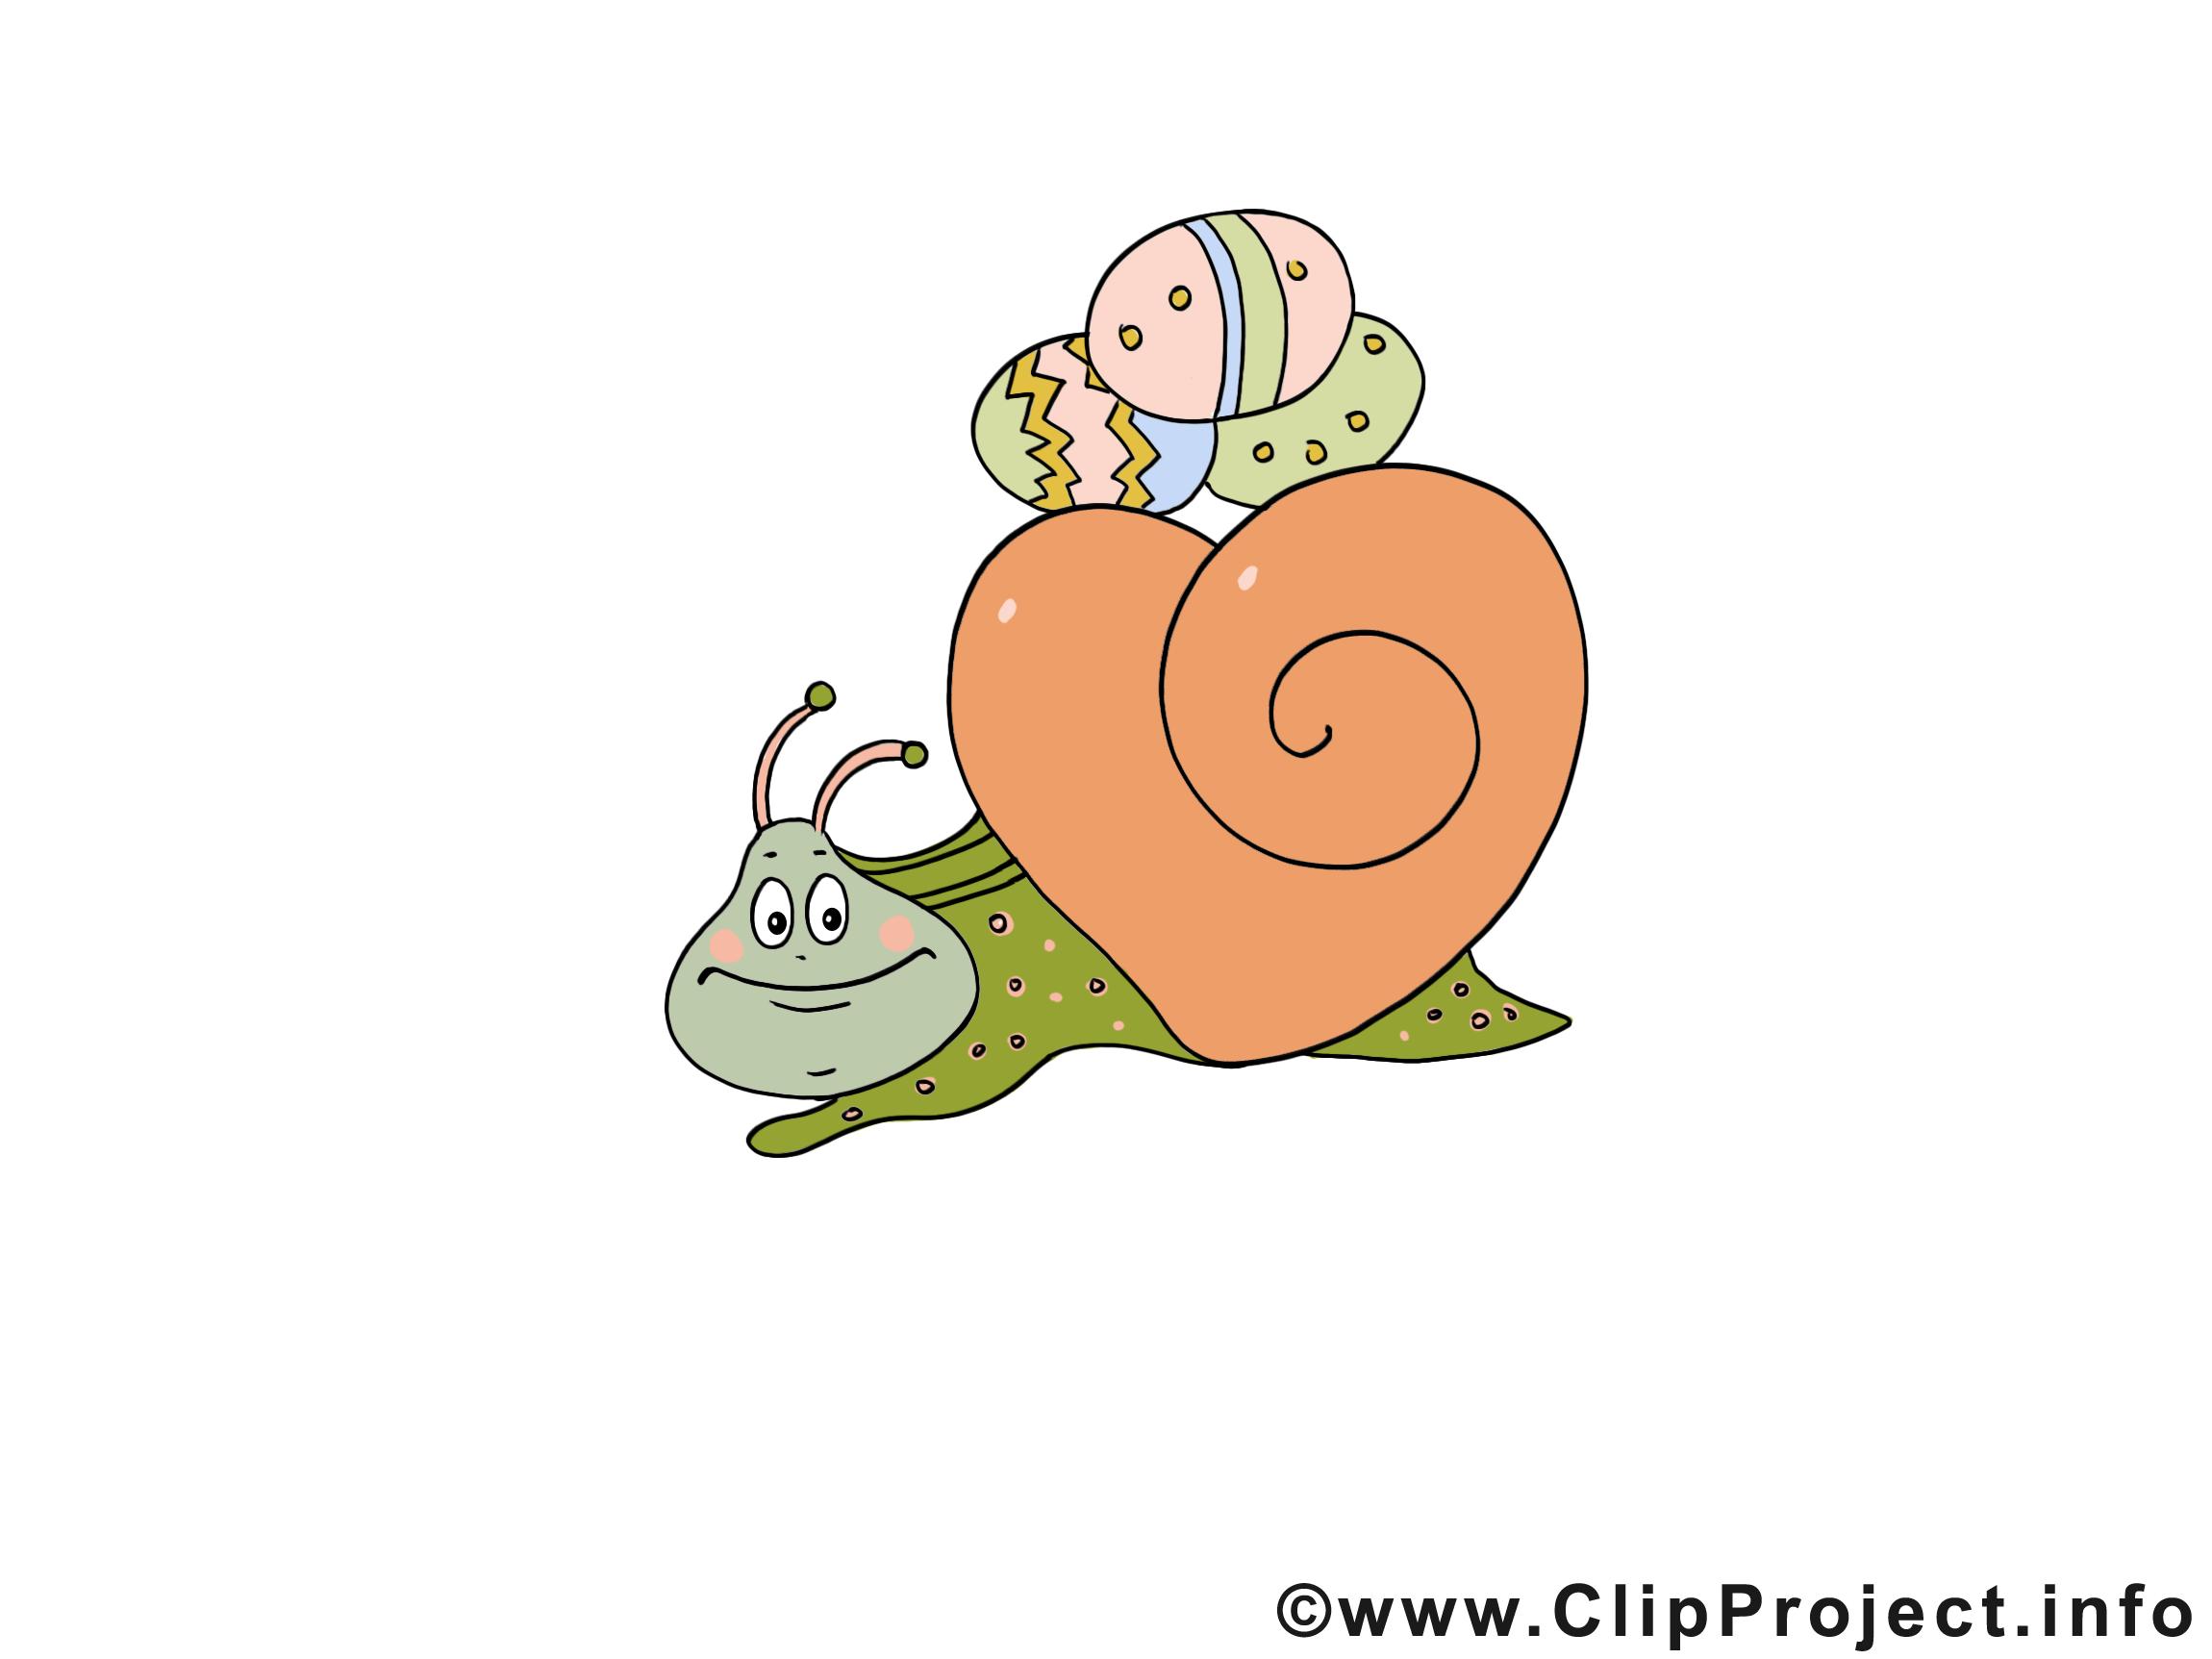 Escargot illustration - Pâques images